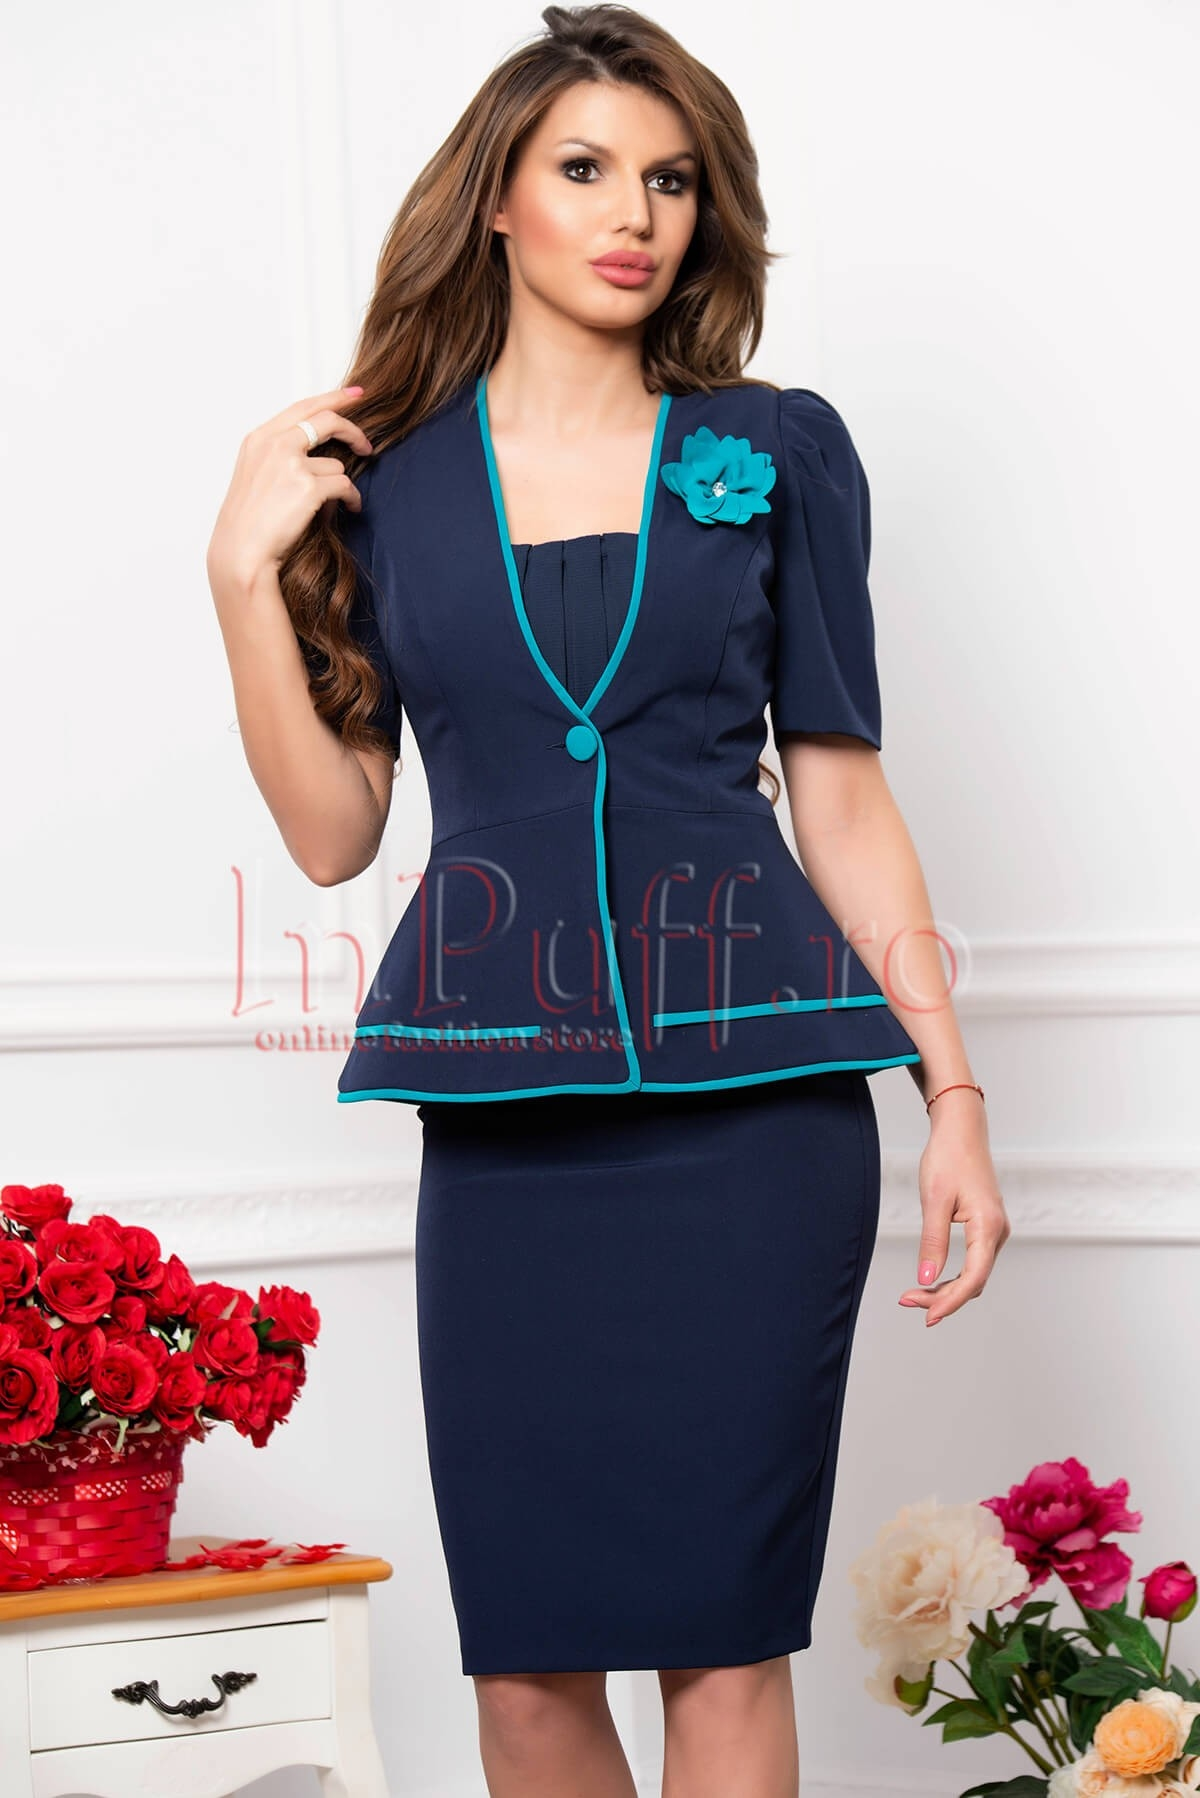 Compleu dama bleumarin cu insertii turcoaz thumbnail